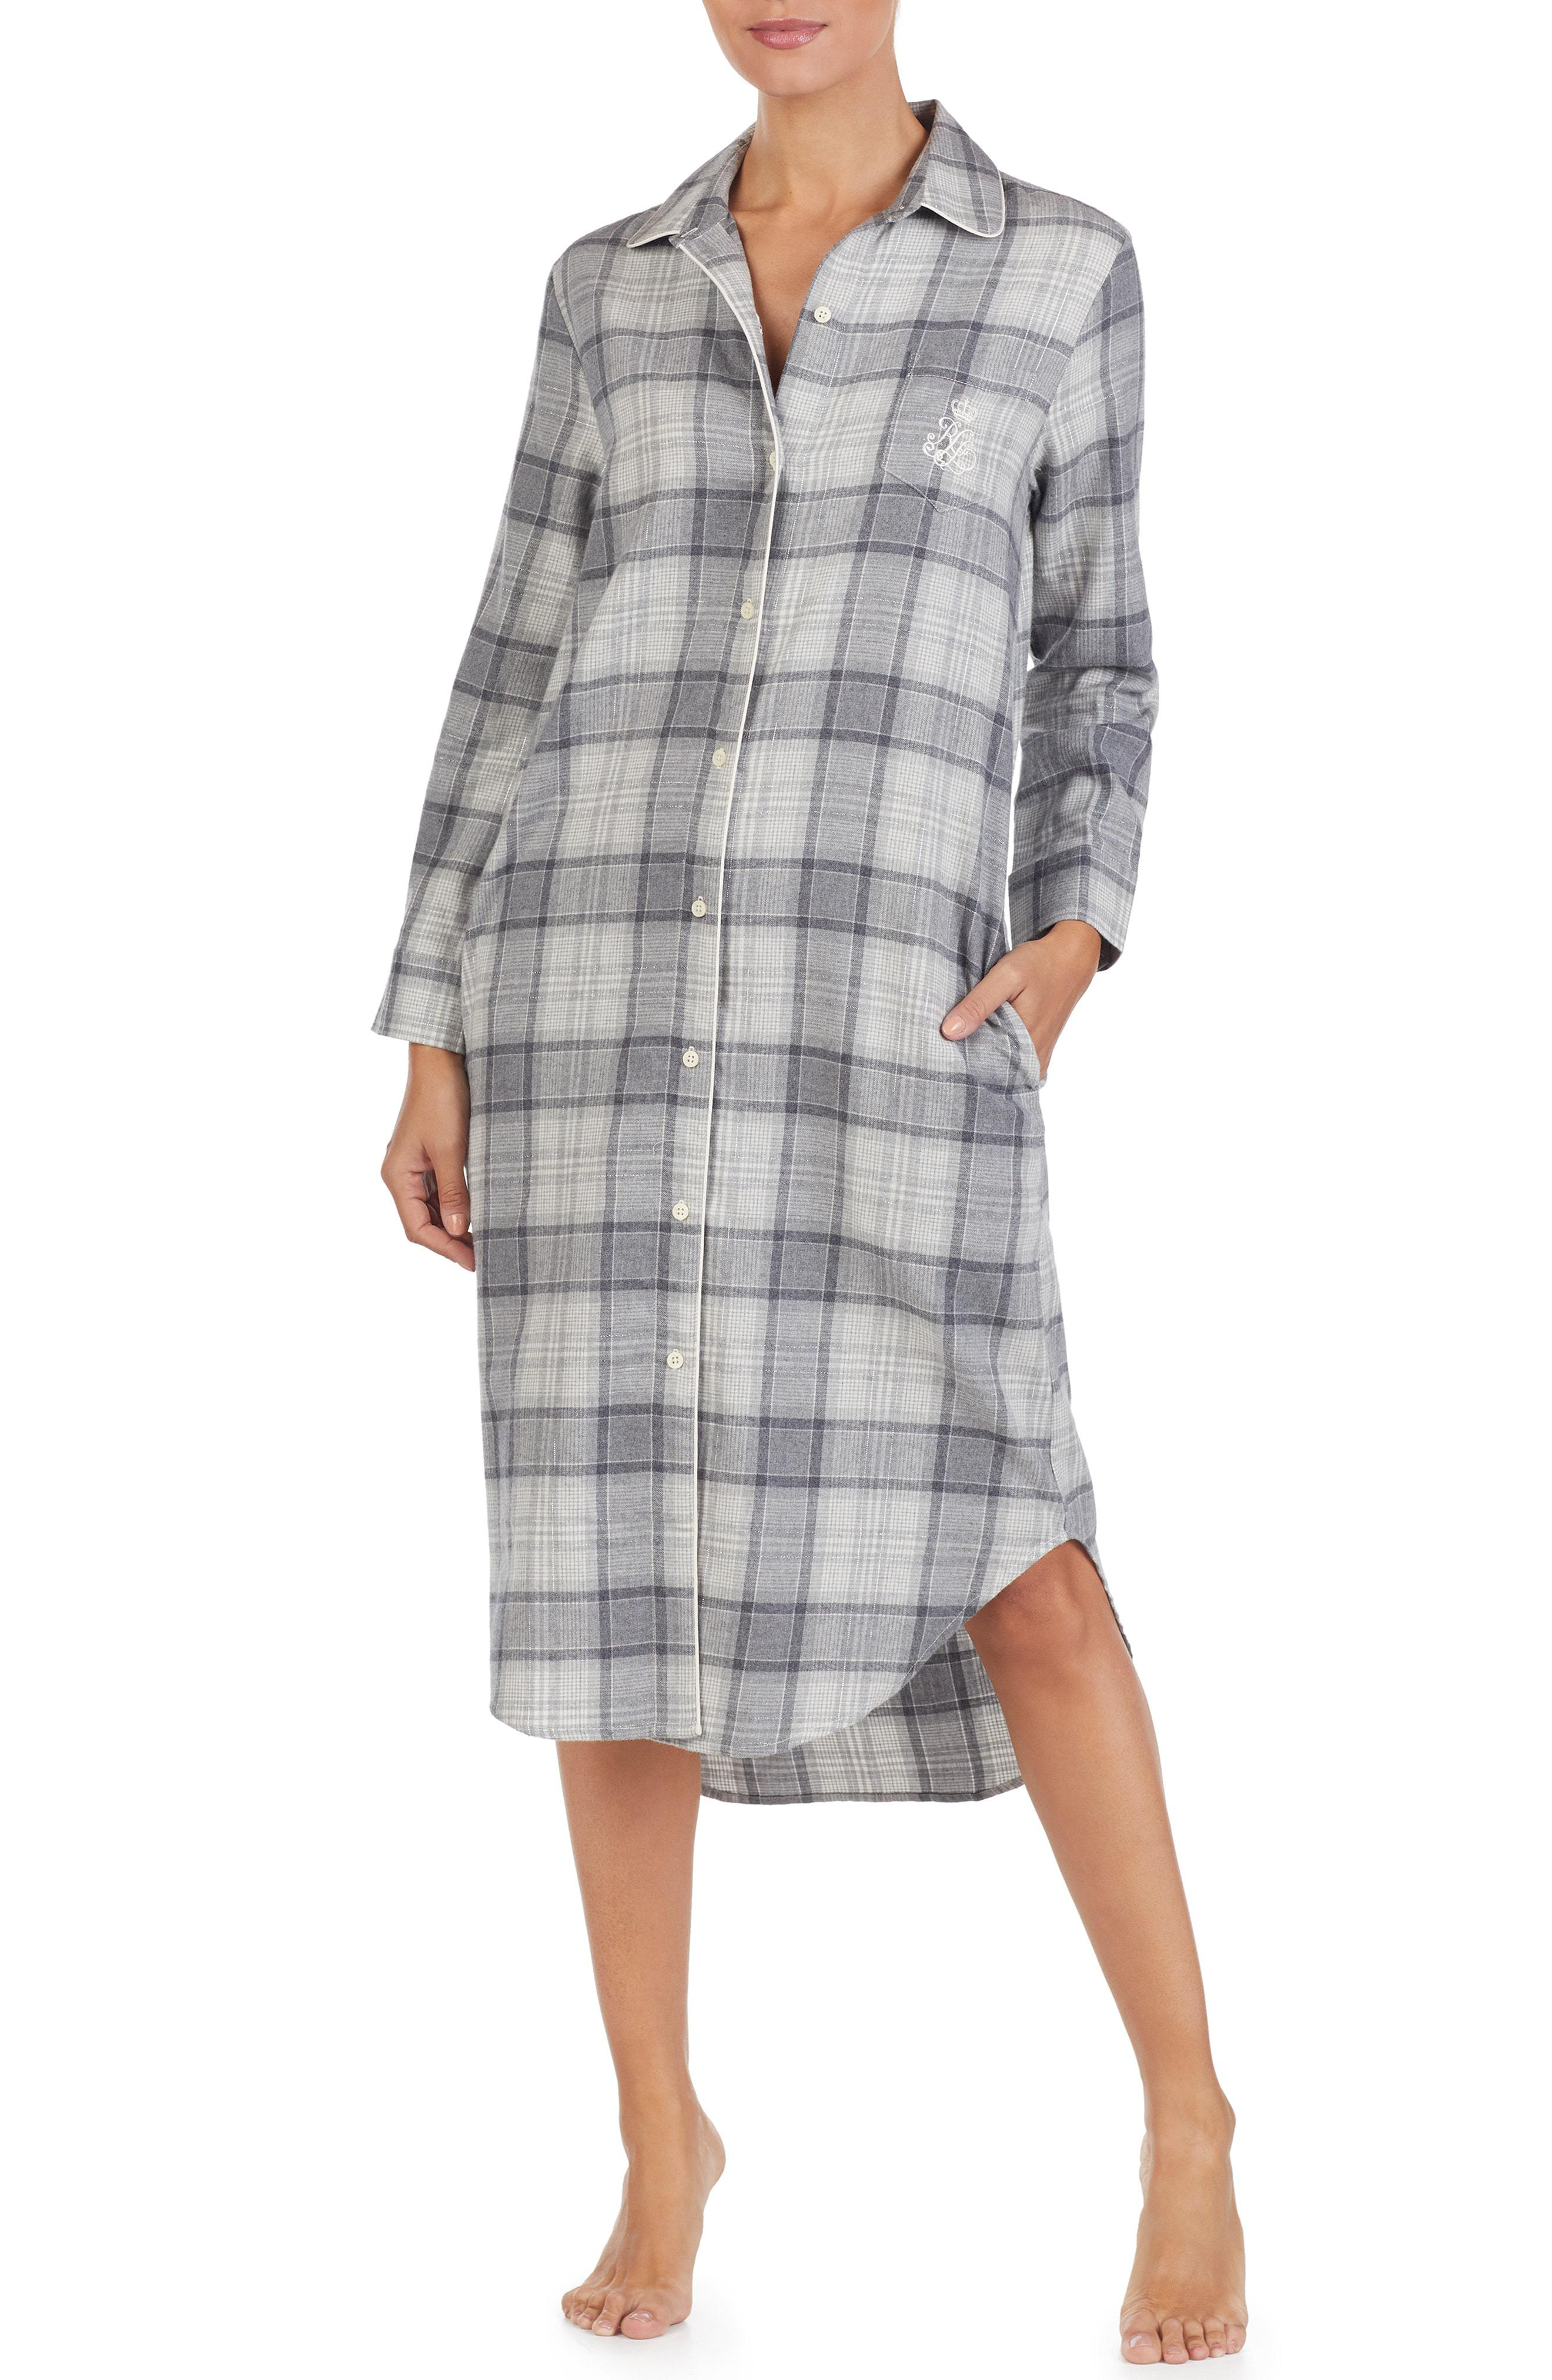 Lyst - Lauren By Ralph Lauren Plaid Flannel Sleep Shirt in Metallic 5c15cecf0